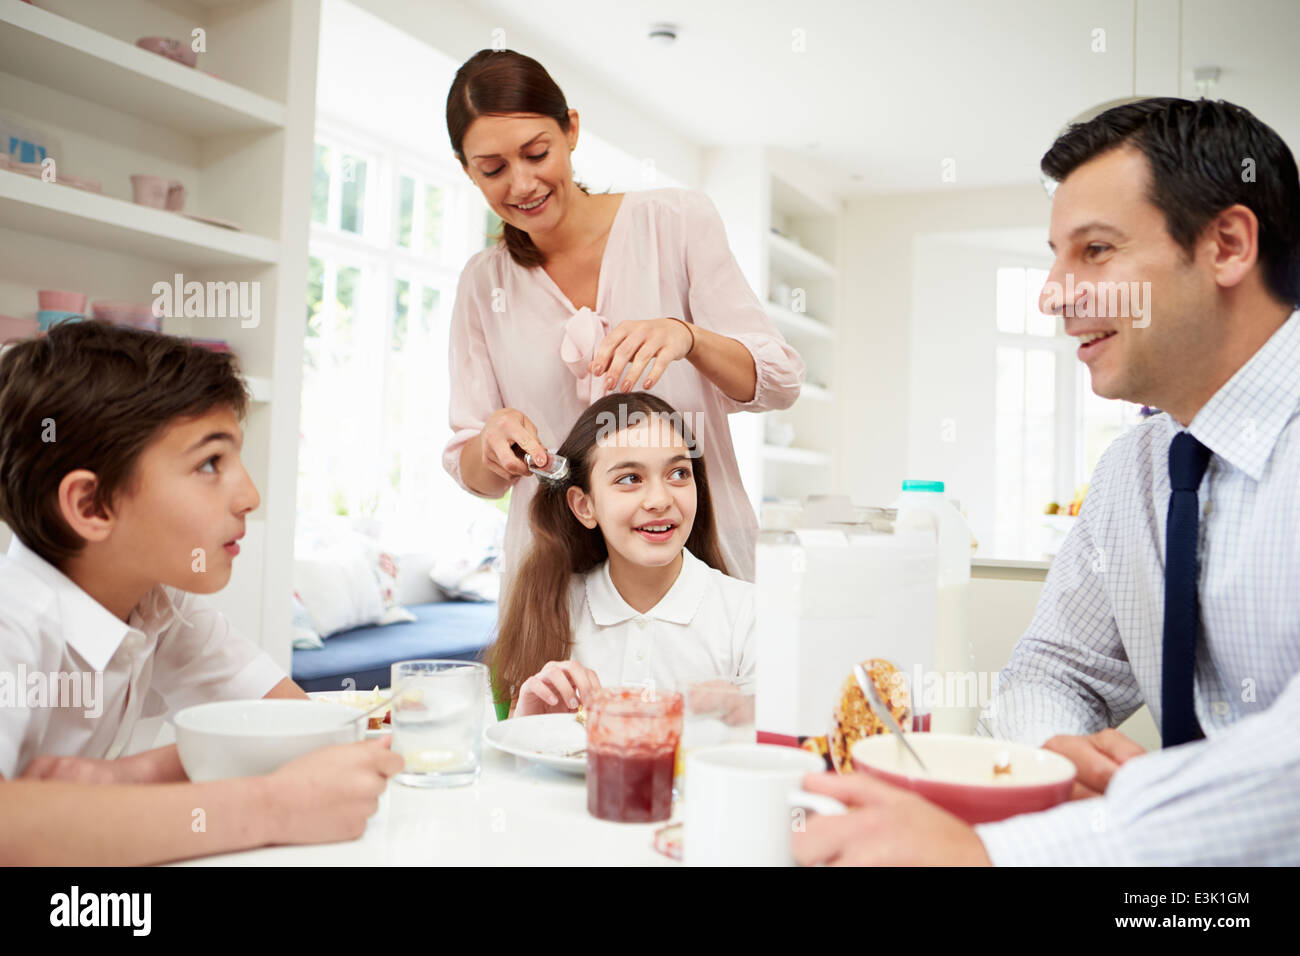 Family Having Breakfast Before Husband Goes To Work - Stock Image